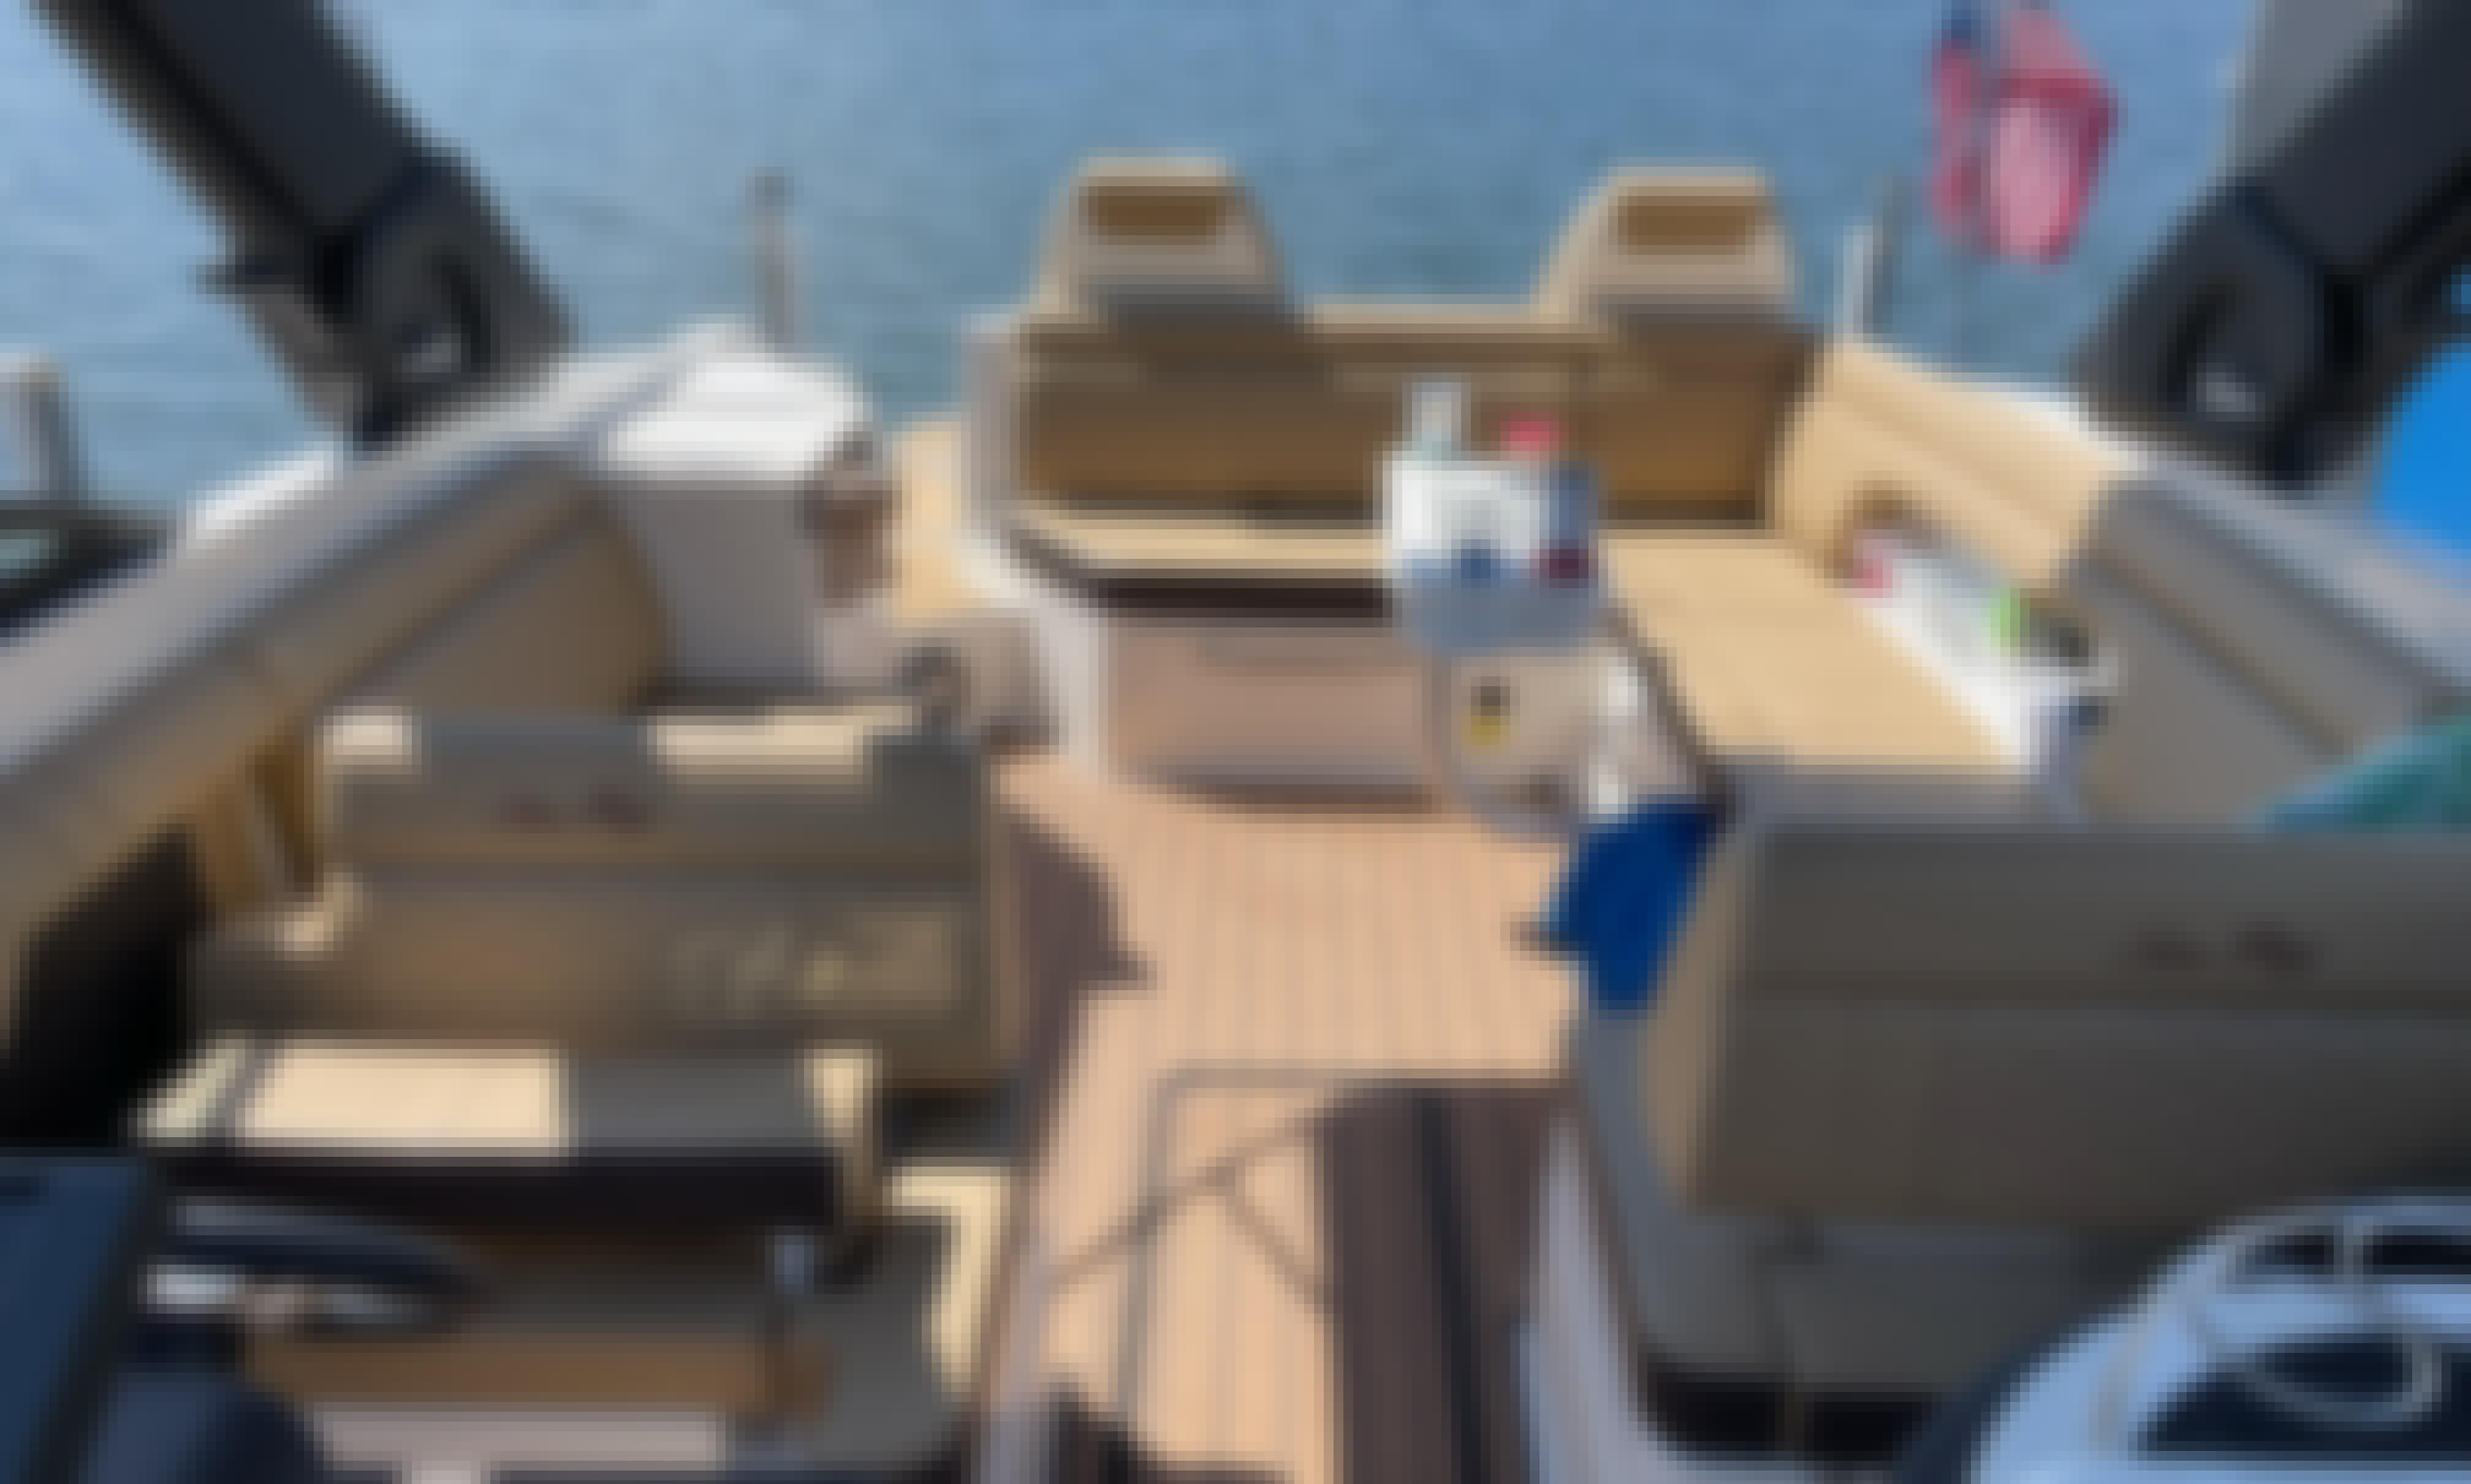 Andiamo!  NEW 29' Luxury Bowrider on Lake Minnetonka - Cruising, Swimming, Bachelor/Bachelorette Parties, and more!